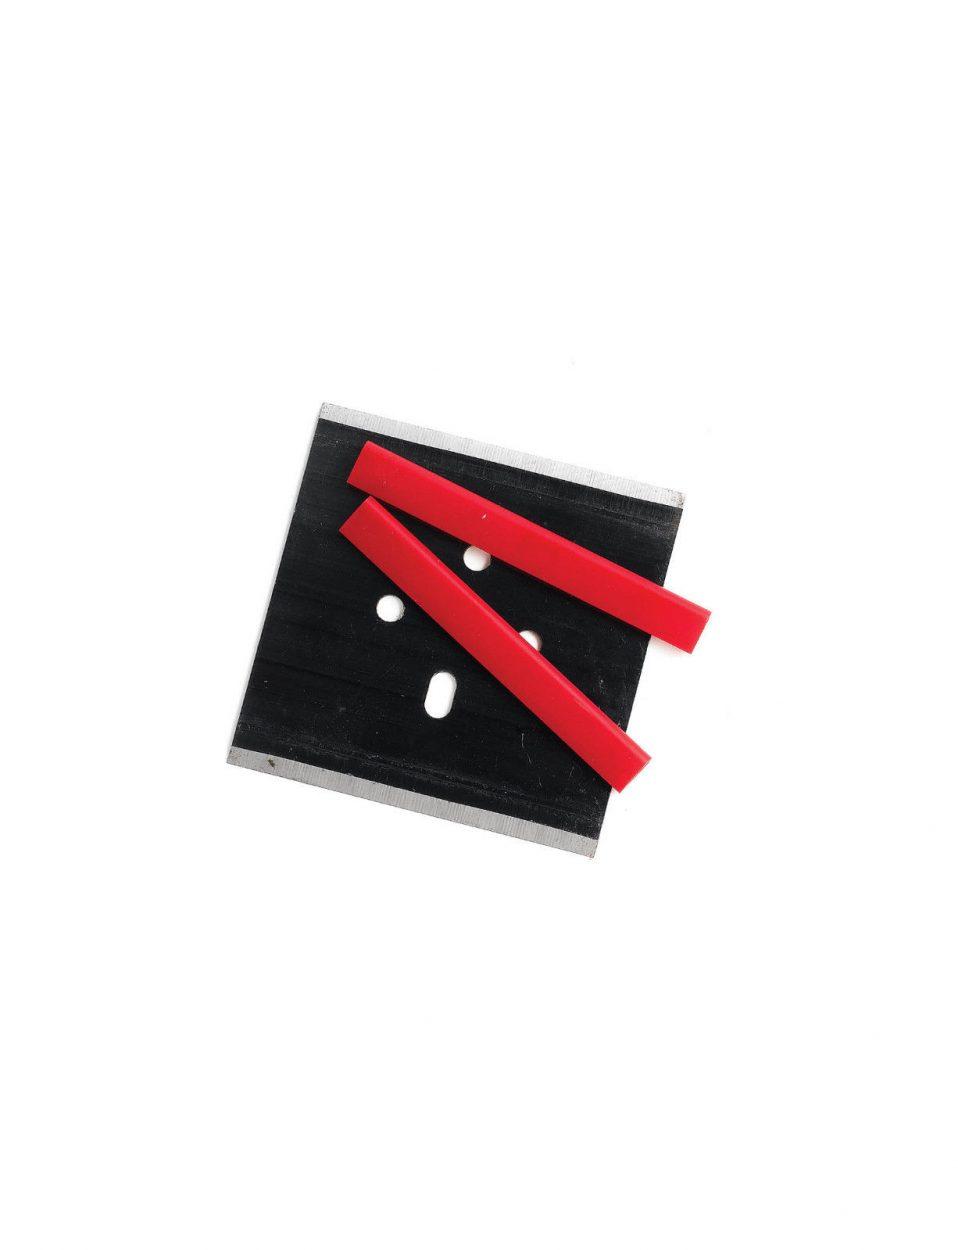 Robust Heavy Duty 4 inch Scraper Blade